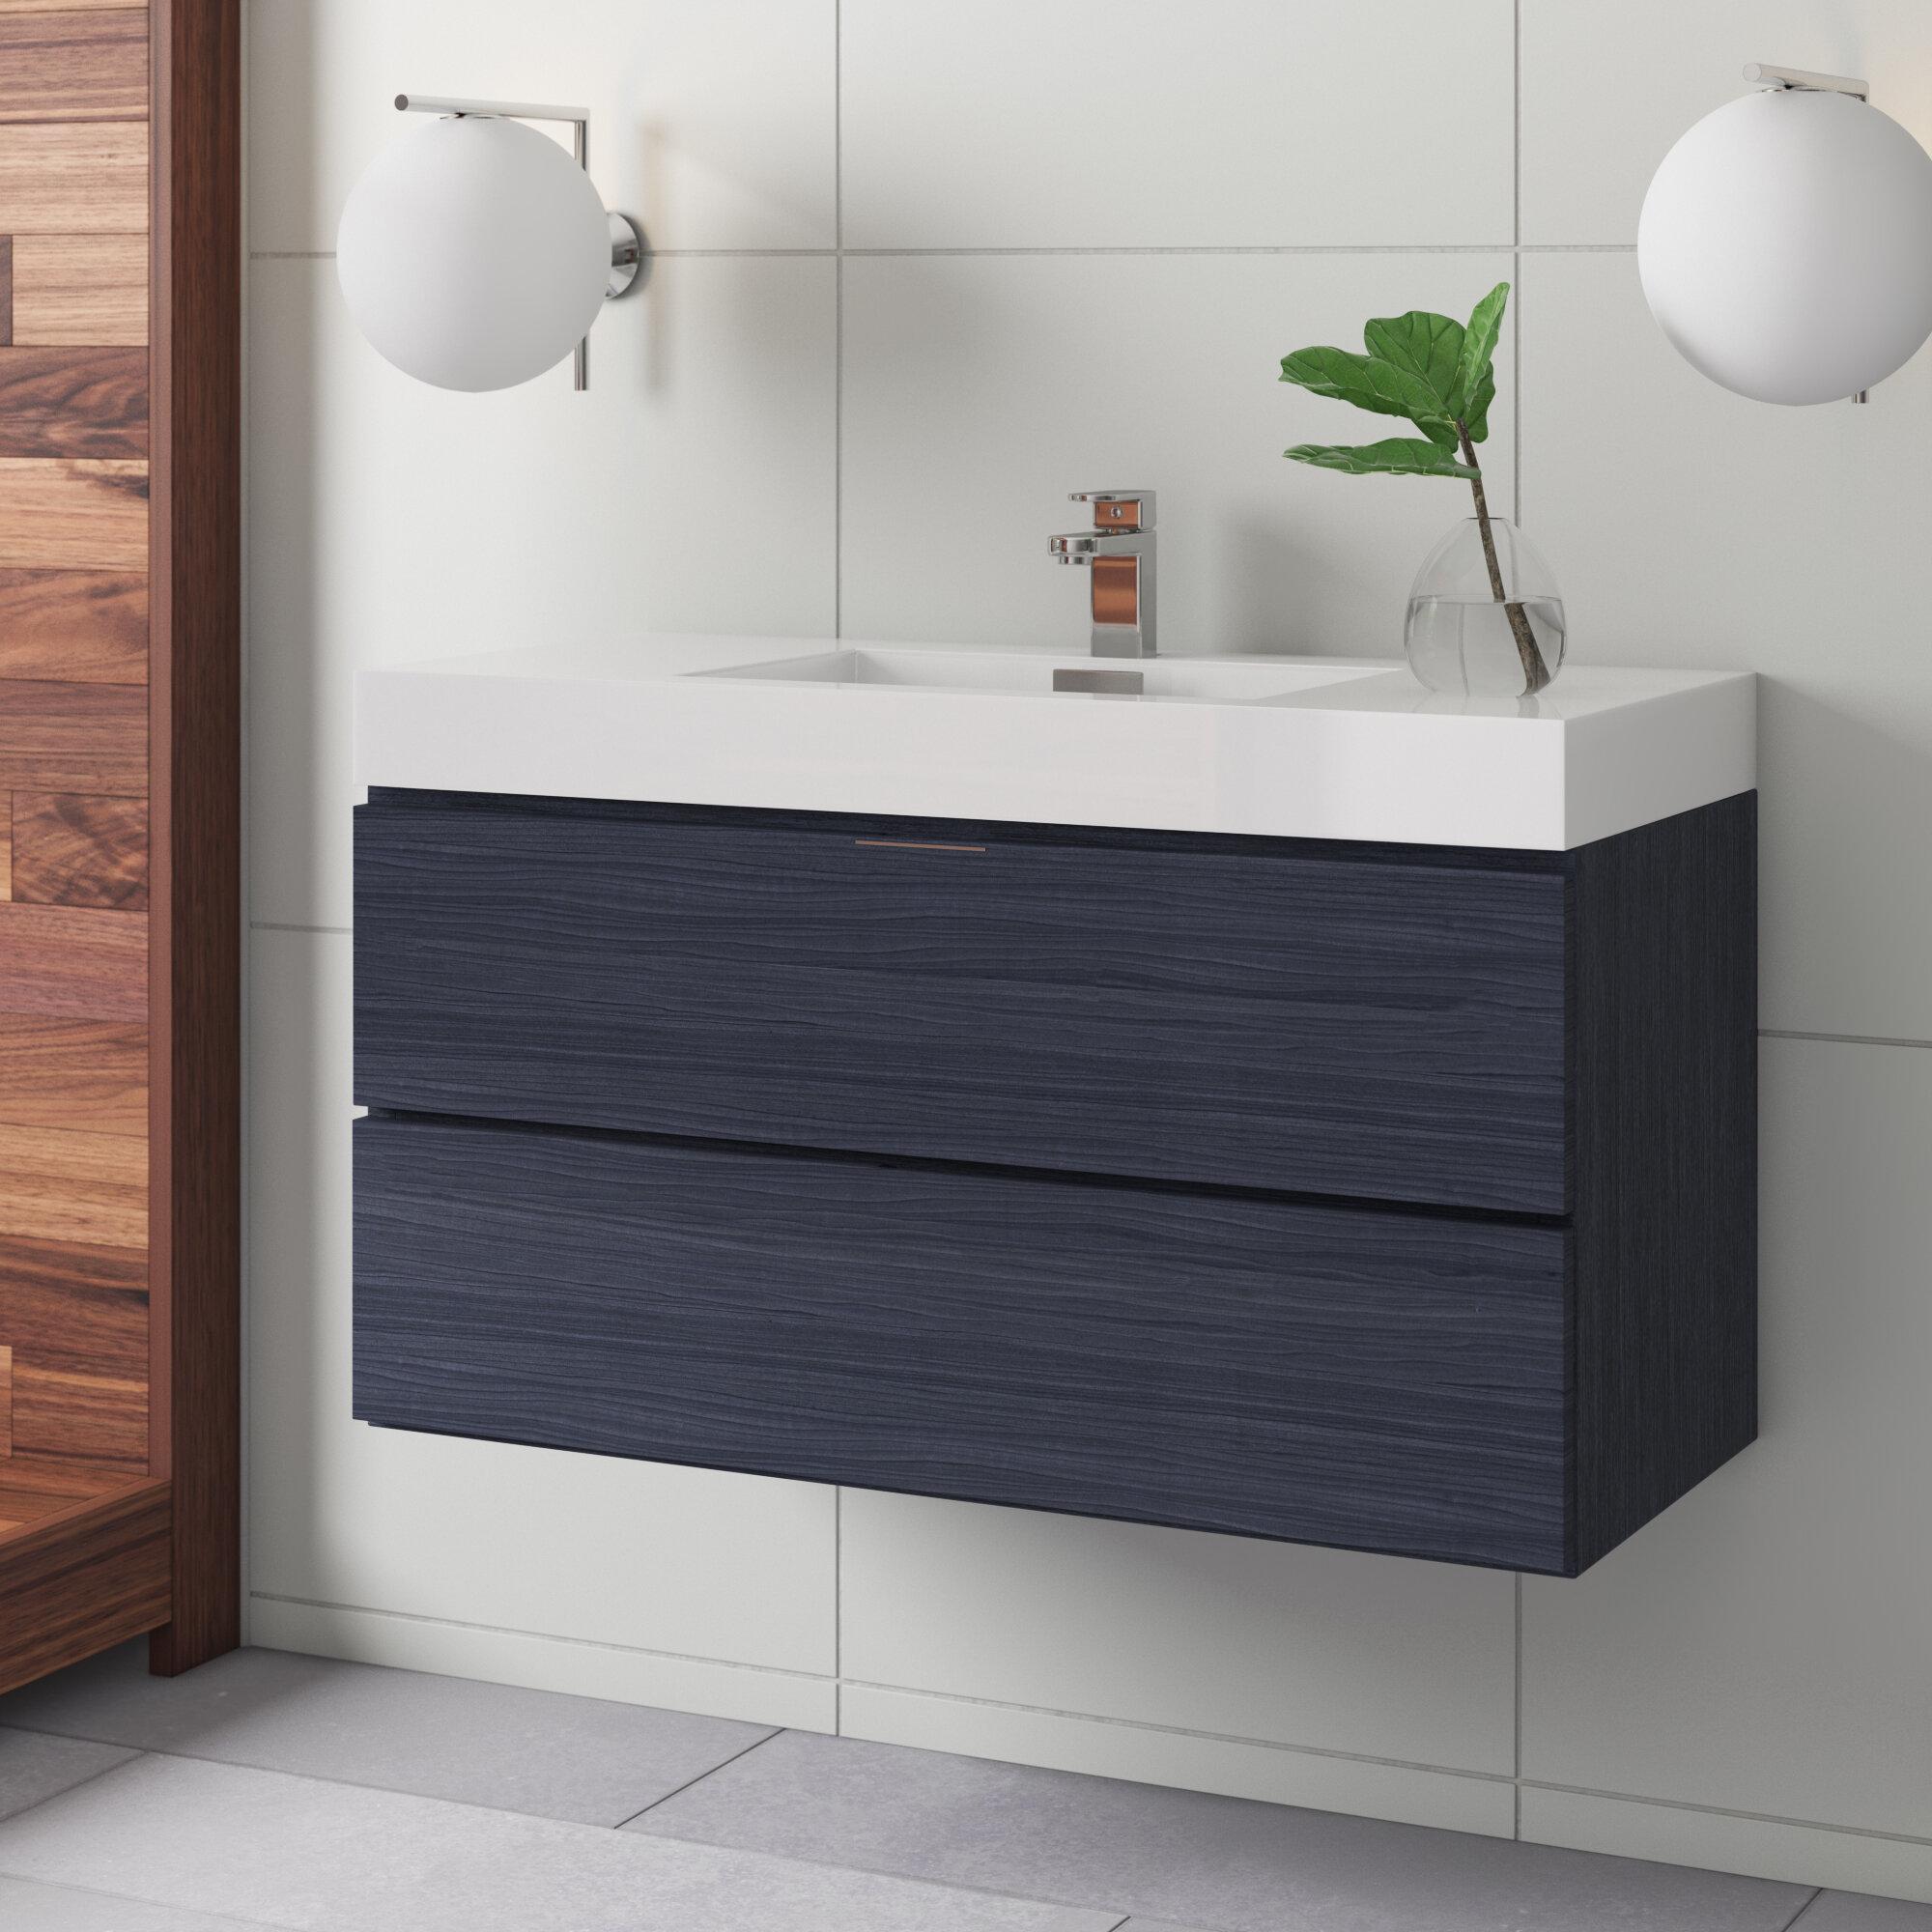 Shania 40 Wall Mounted Single Bathroom Vanity Set Reviews Allmodern